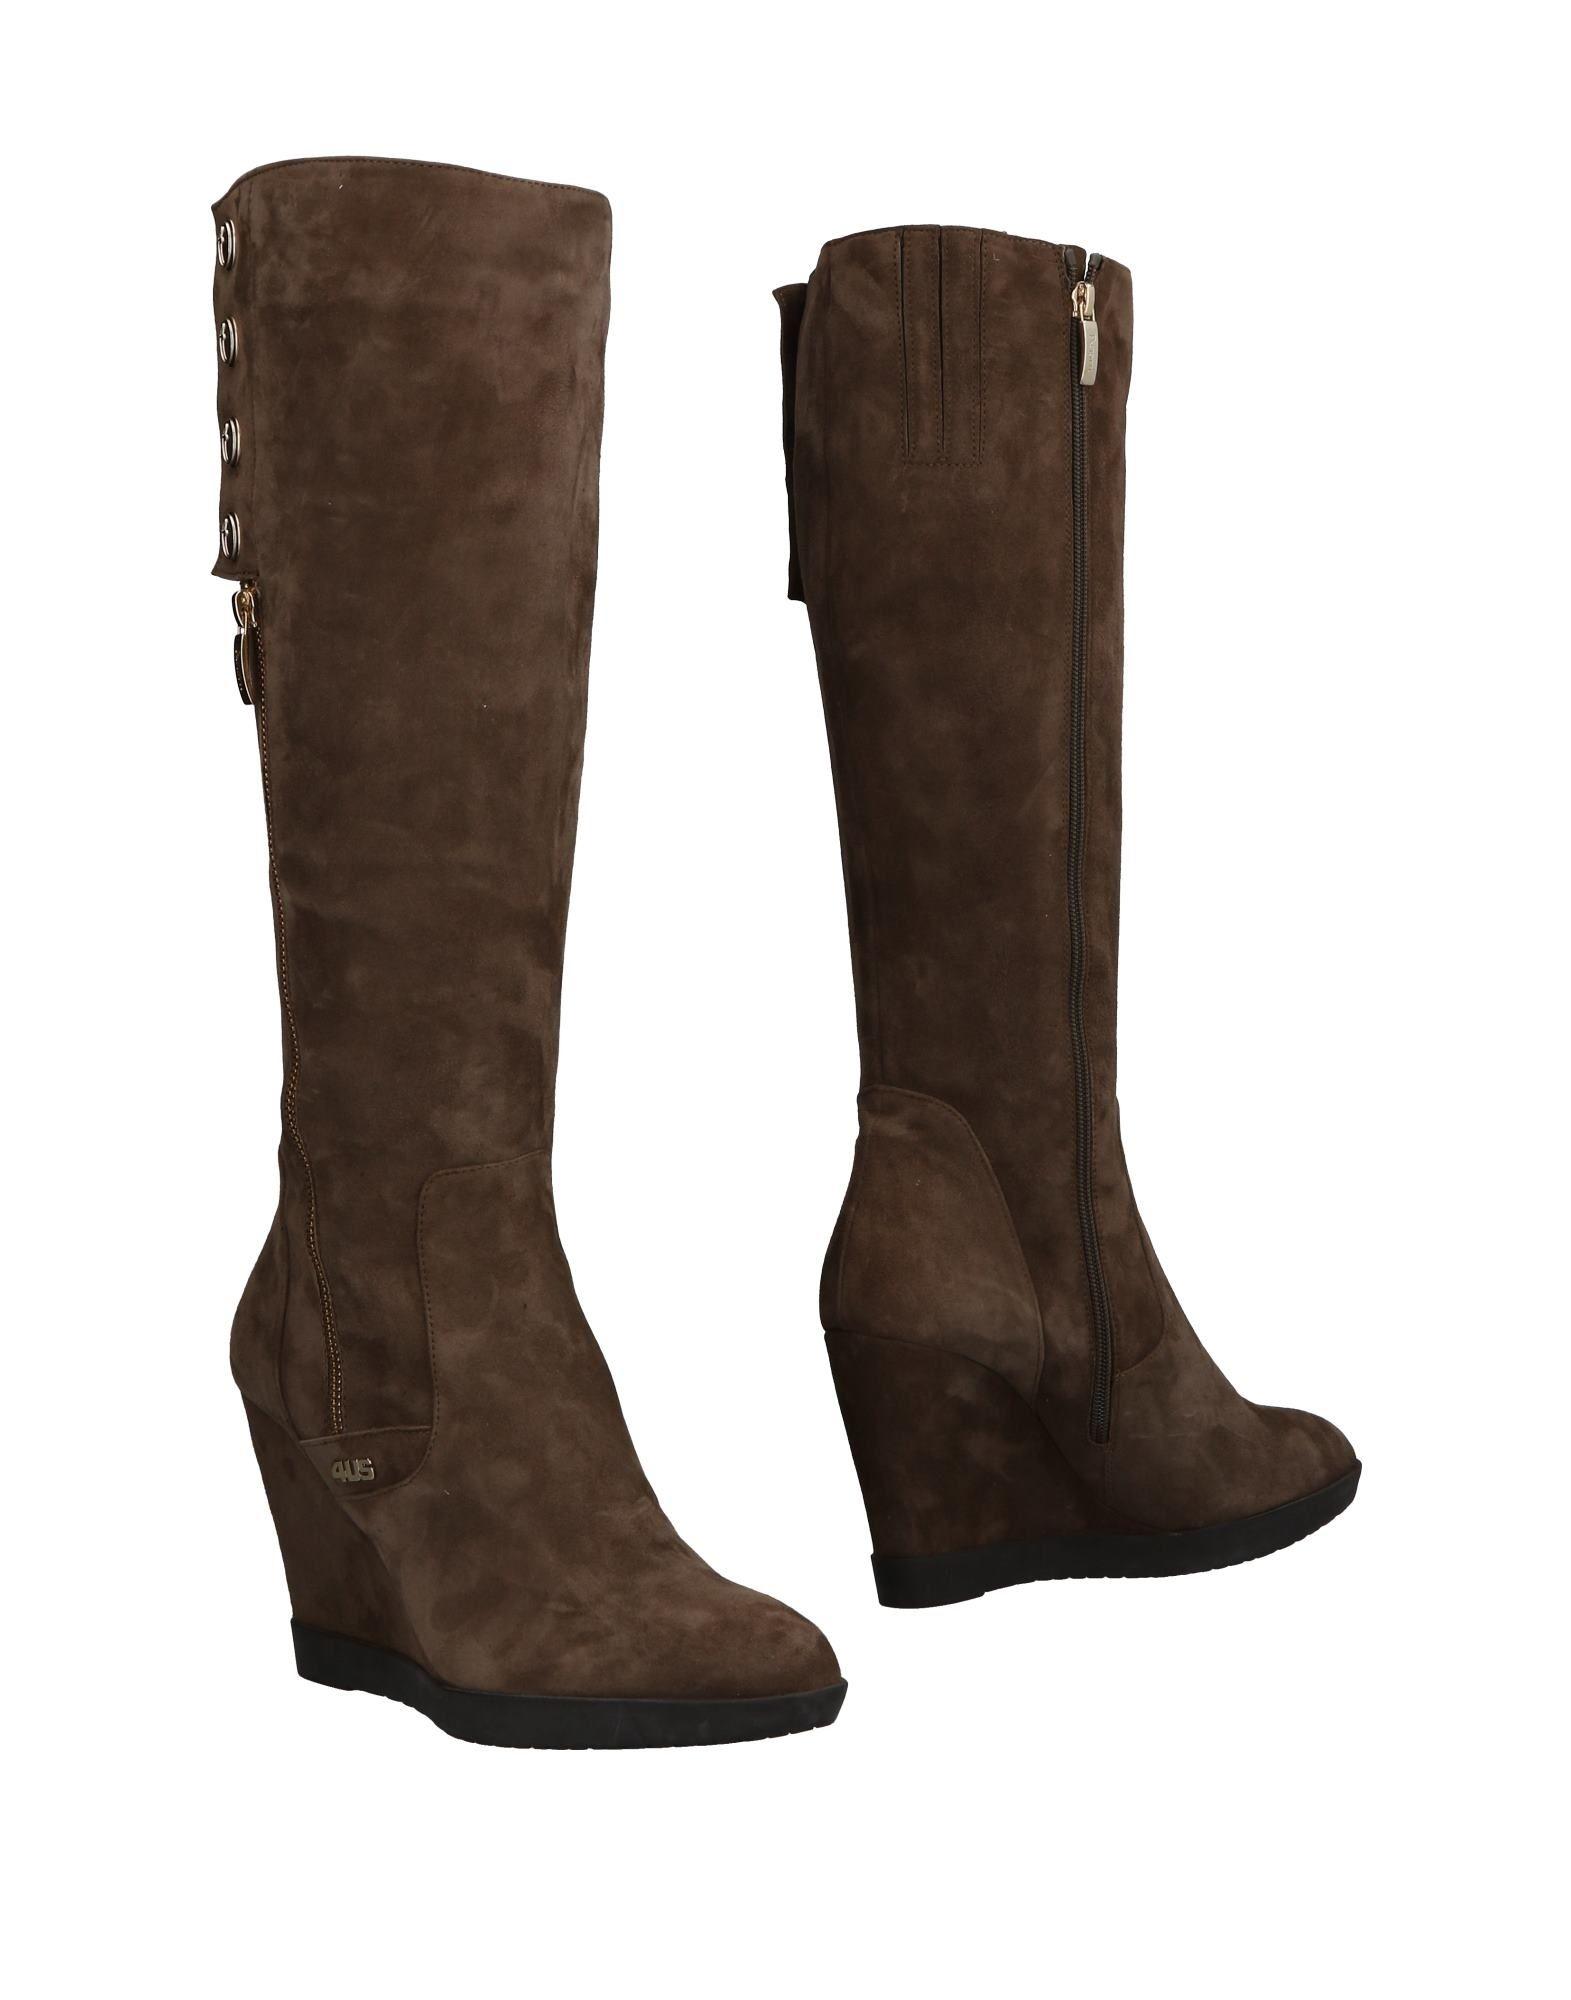 Rabatt Schuhe Cesare Paciotti 4Us Stiefel Damen Damen Stiefel  11498900DG 871d2e